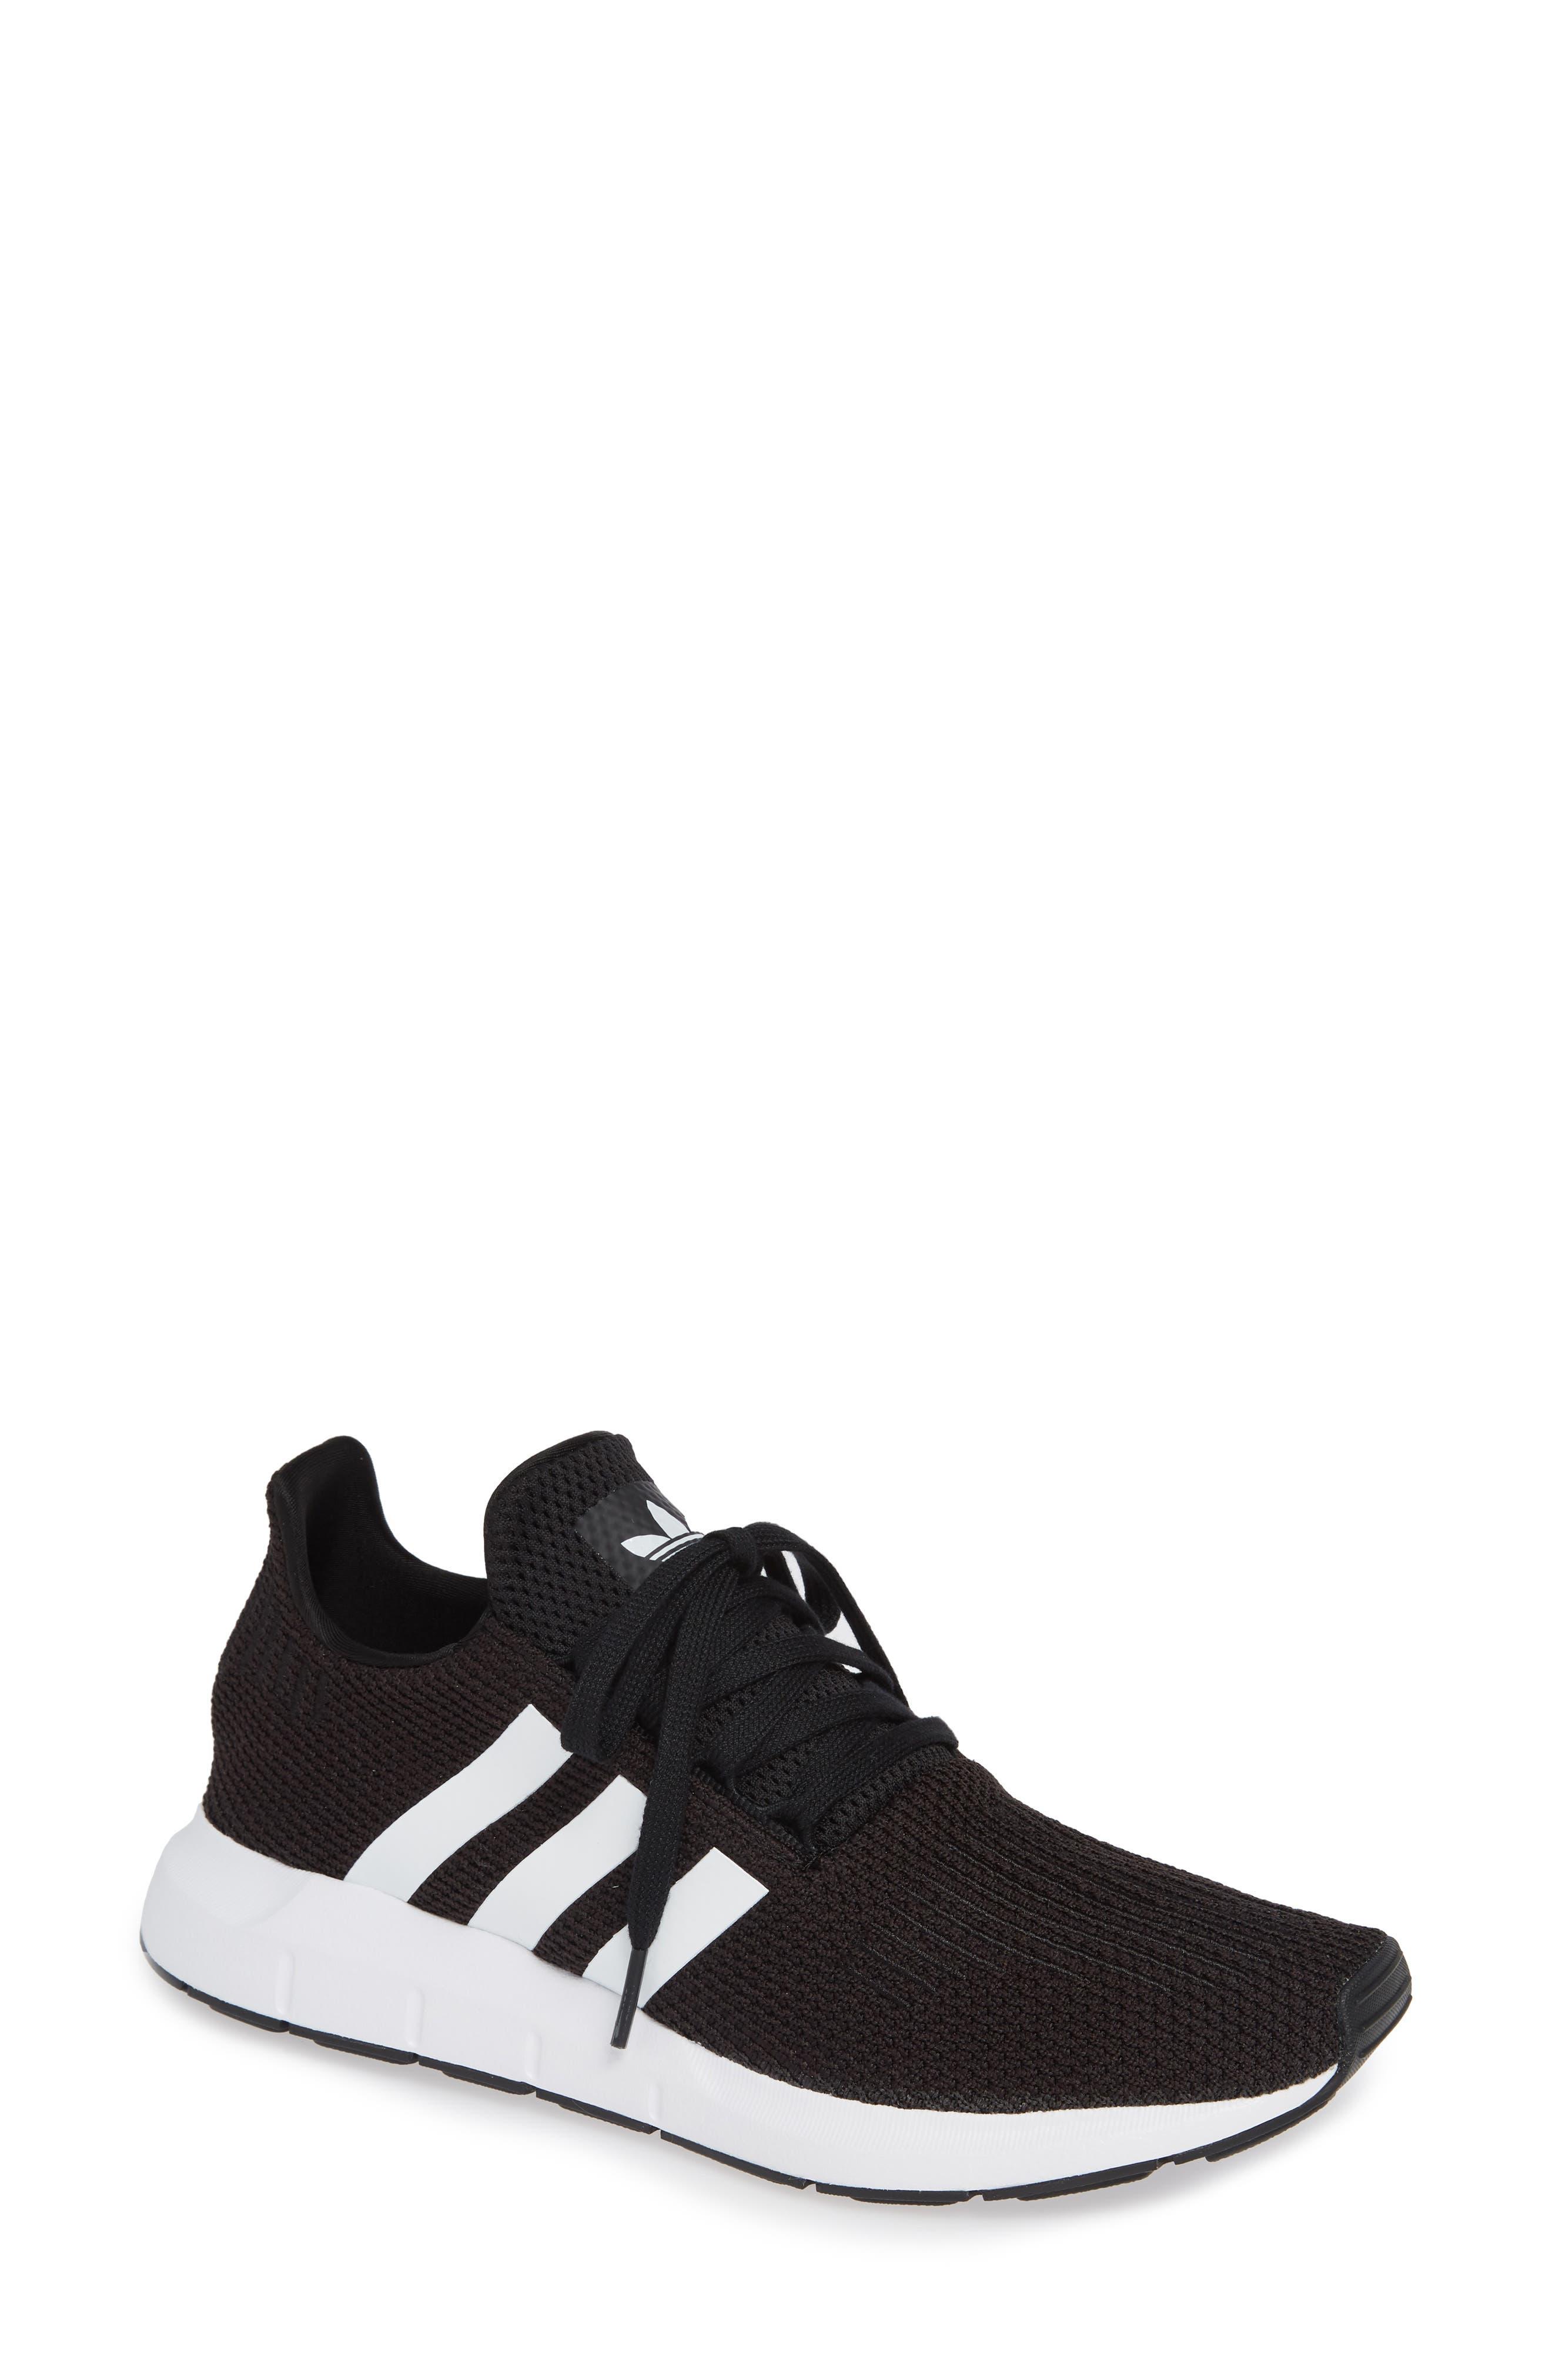 Swift Run Sneaker,                             Main thumbnail 1, color,                             Black/ White